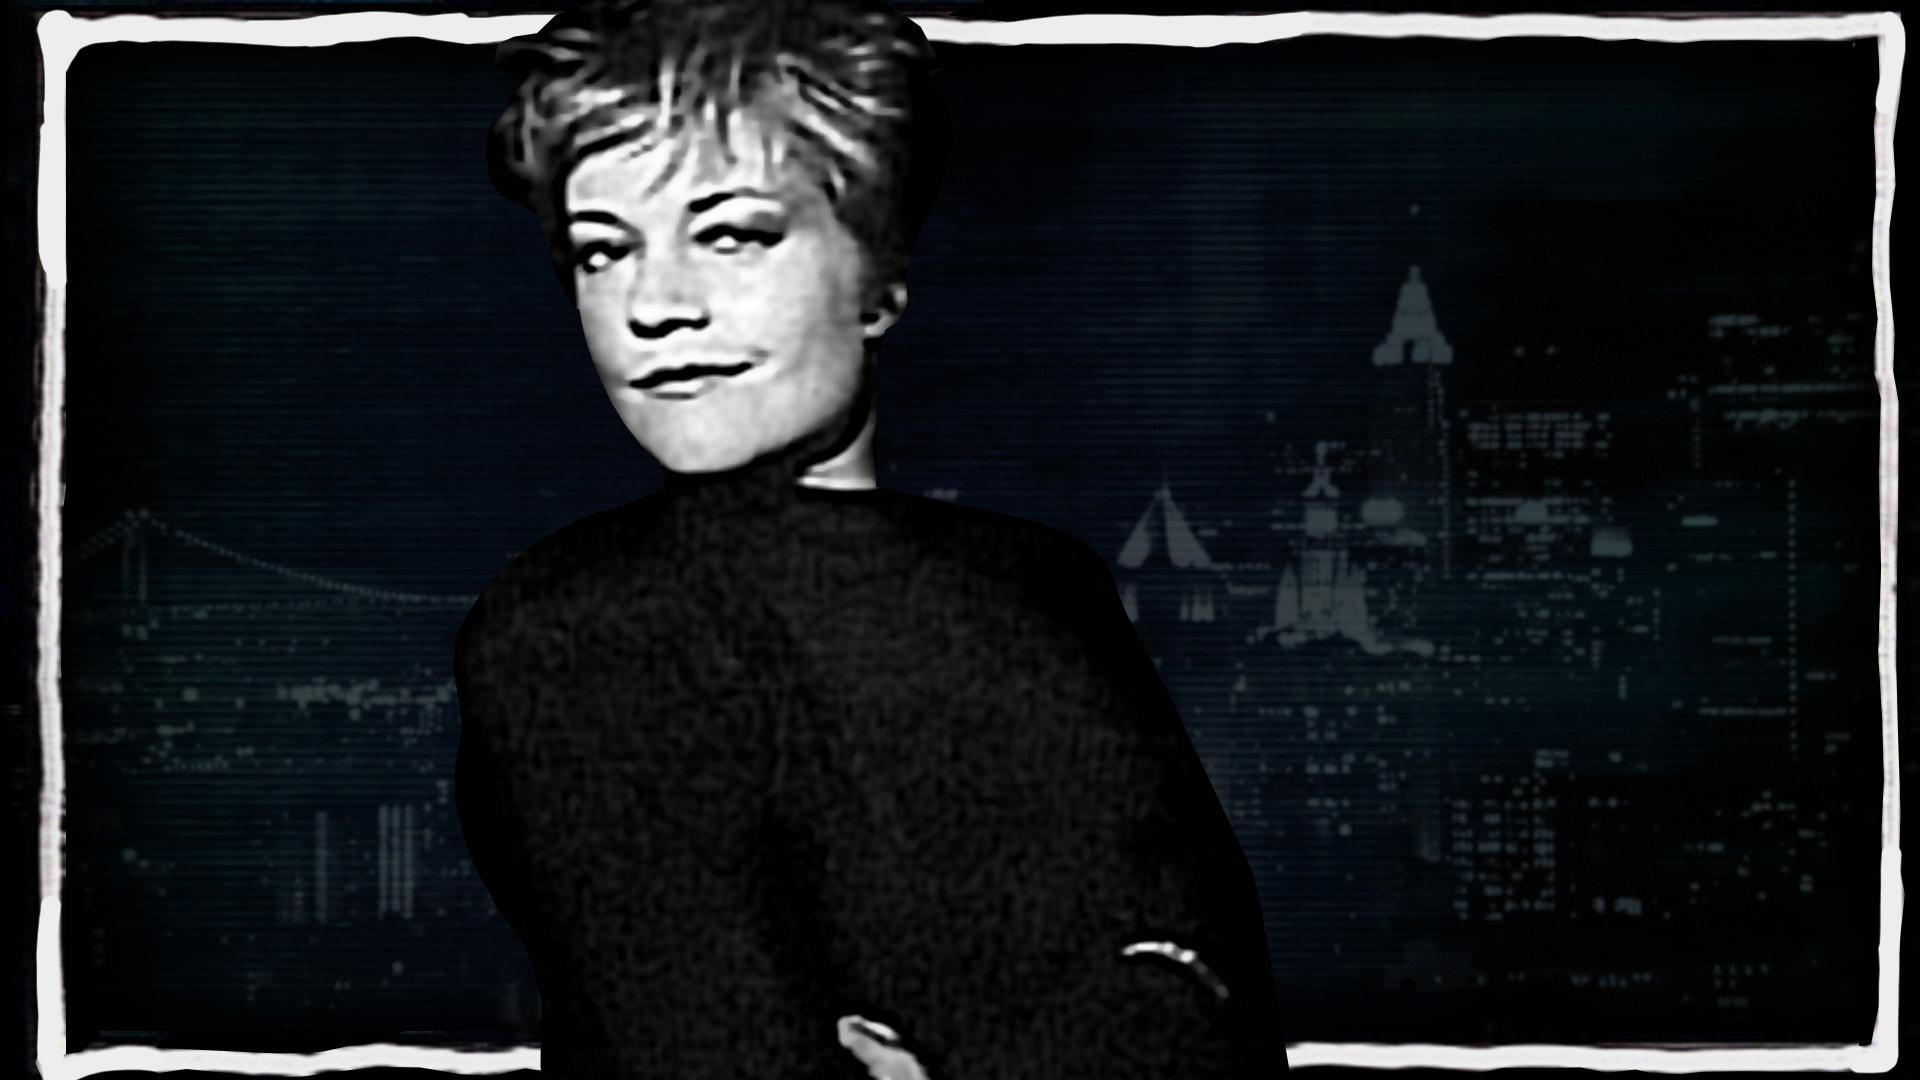 Melanie Griffith: December 17, 1988